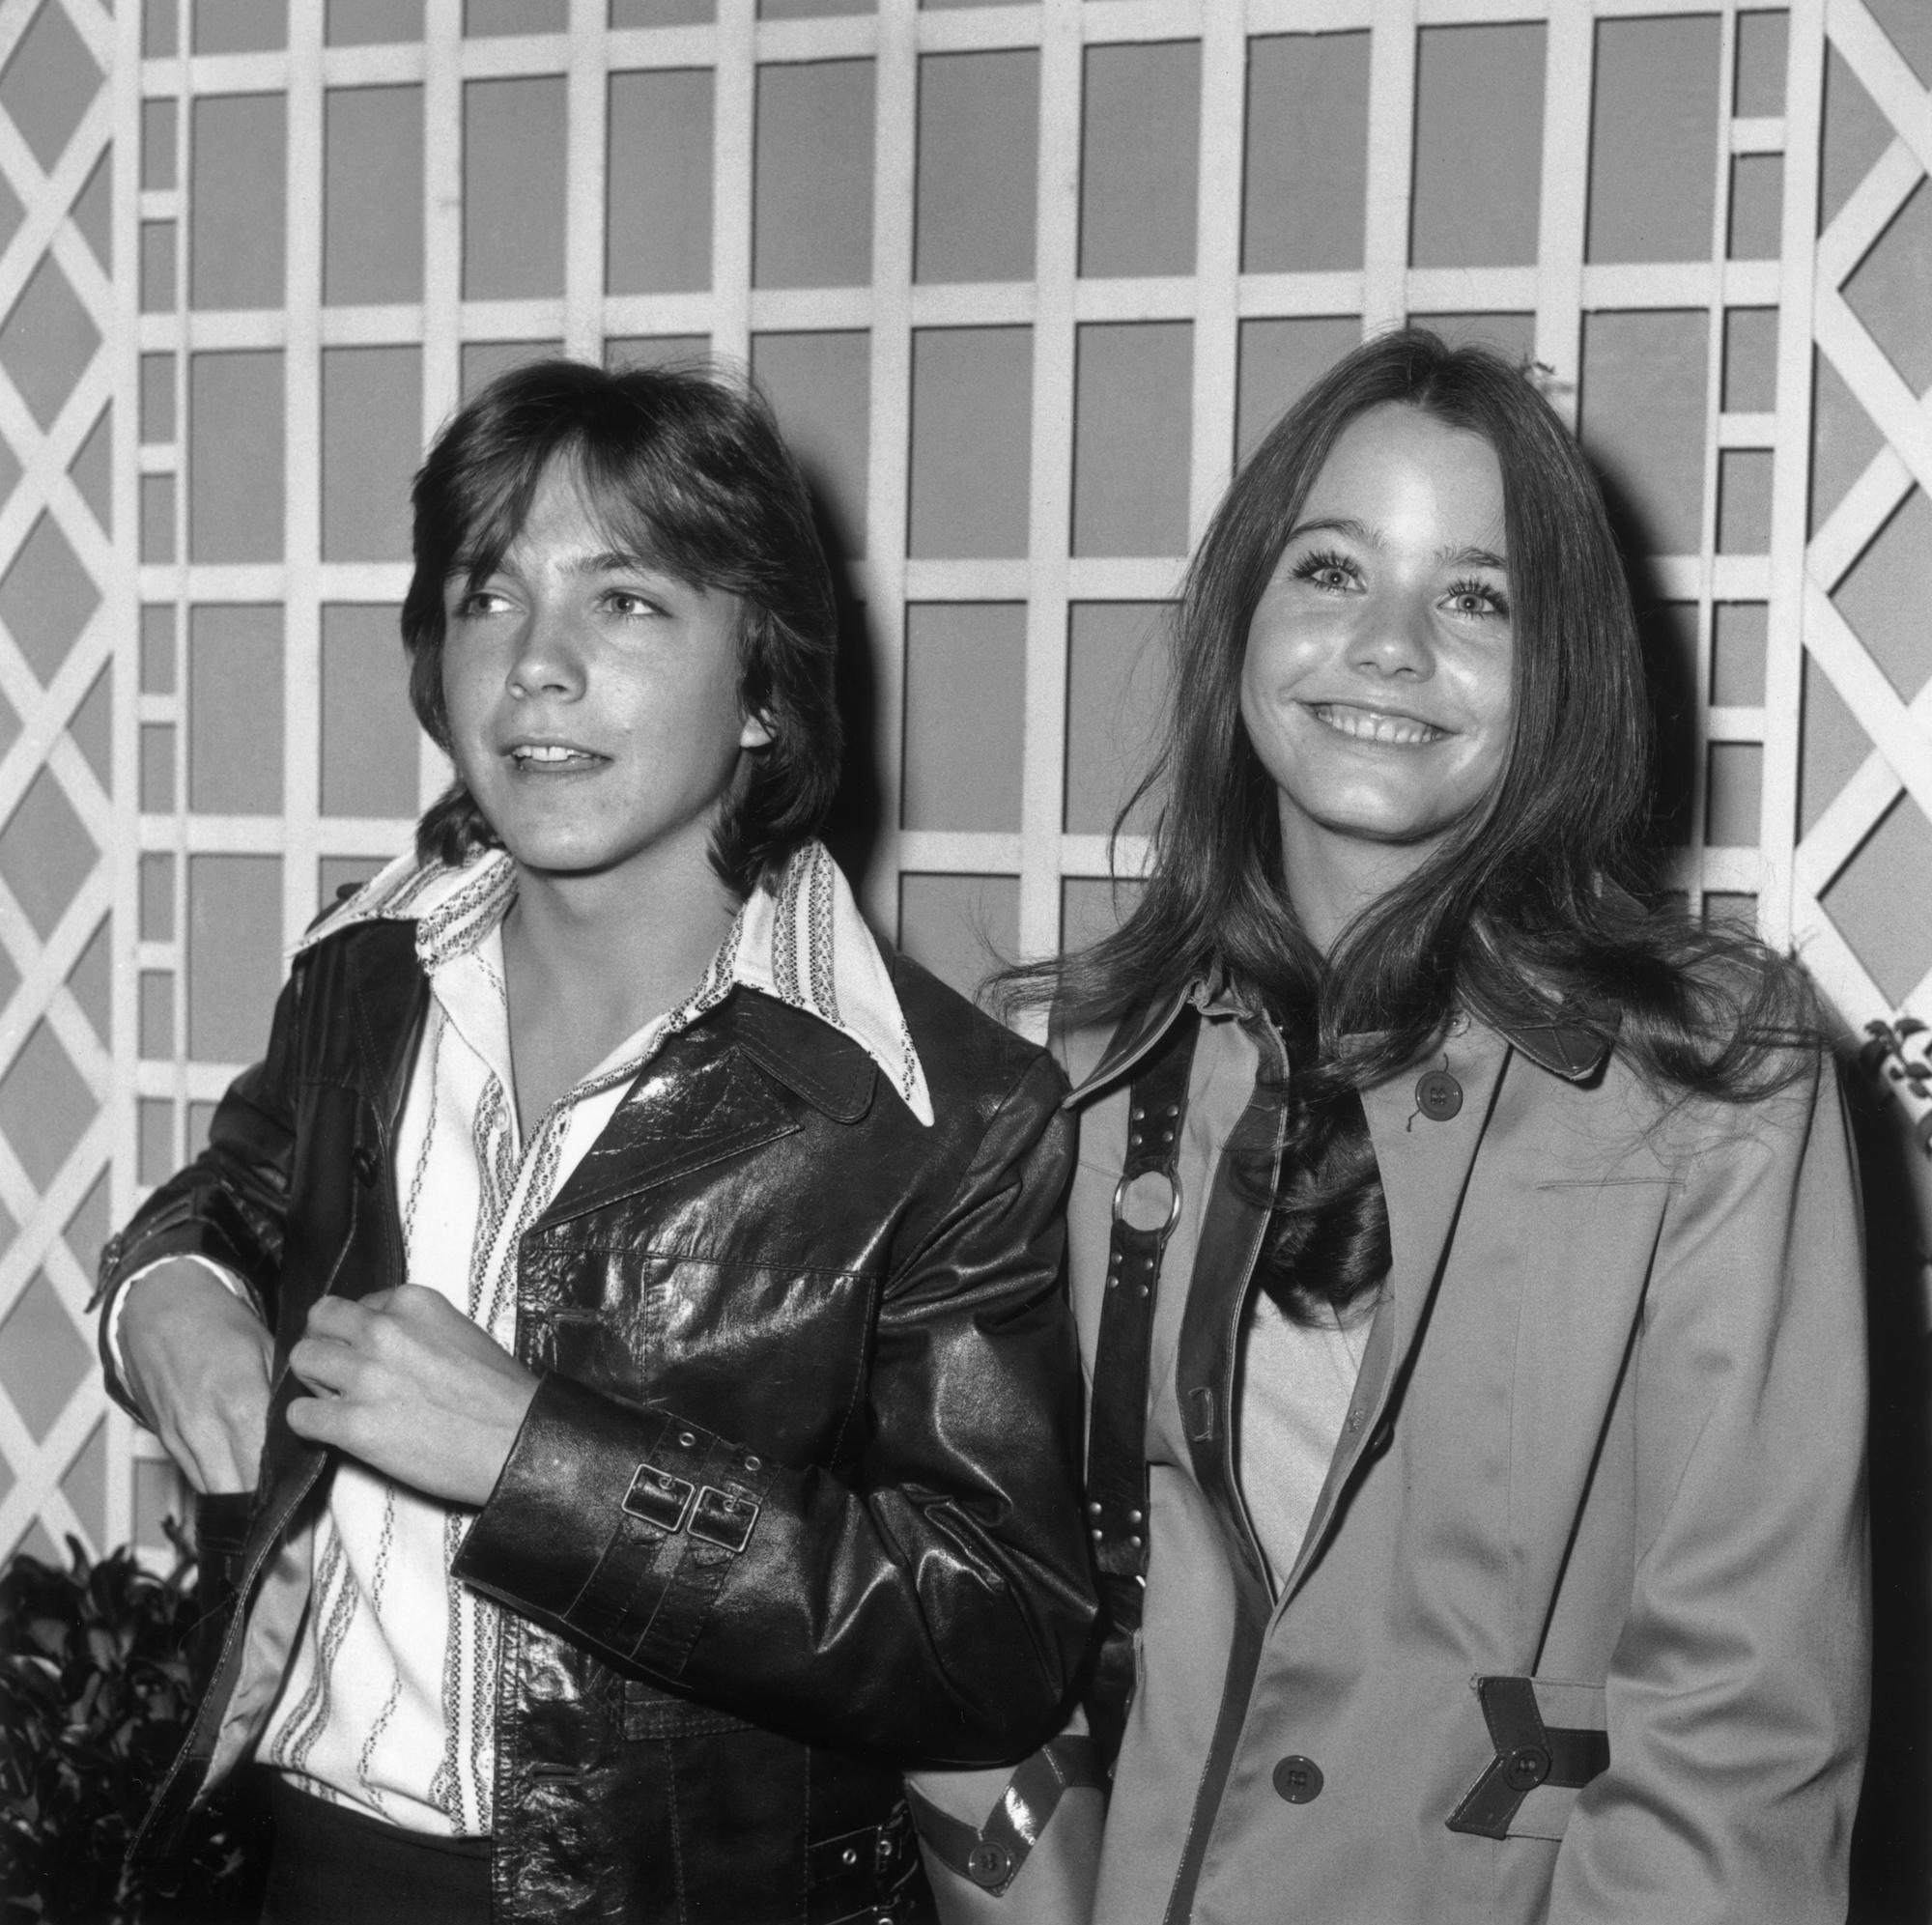 David Cassidy and Susan Dey smiling